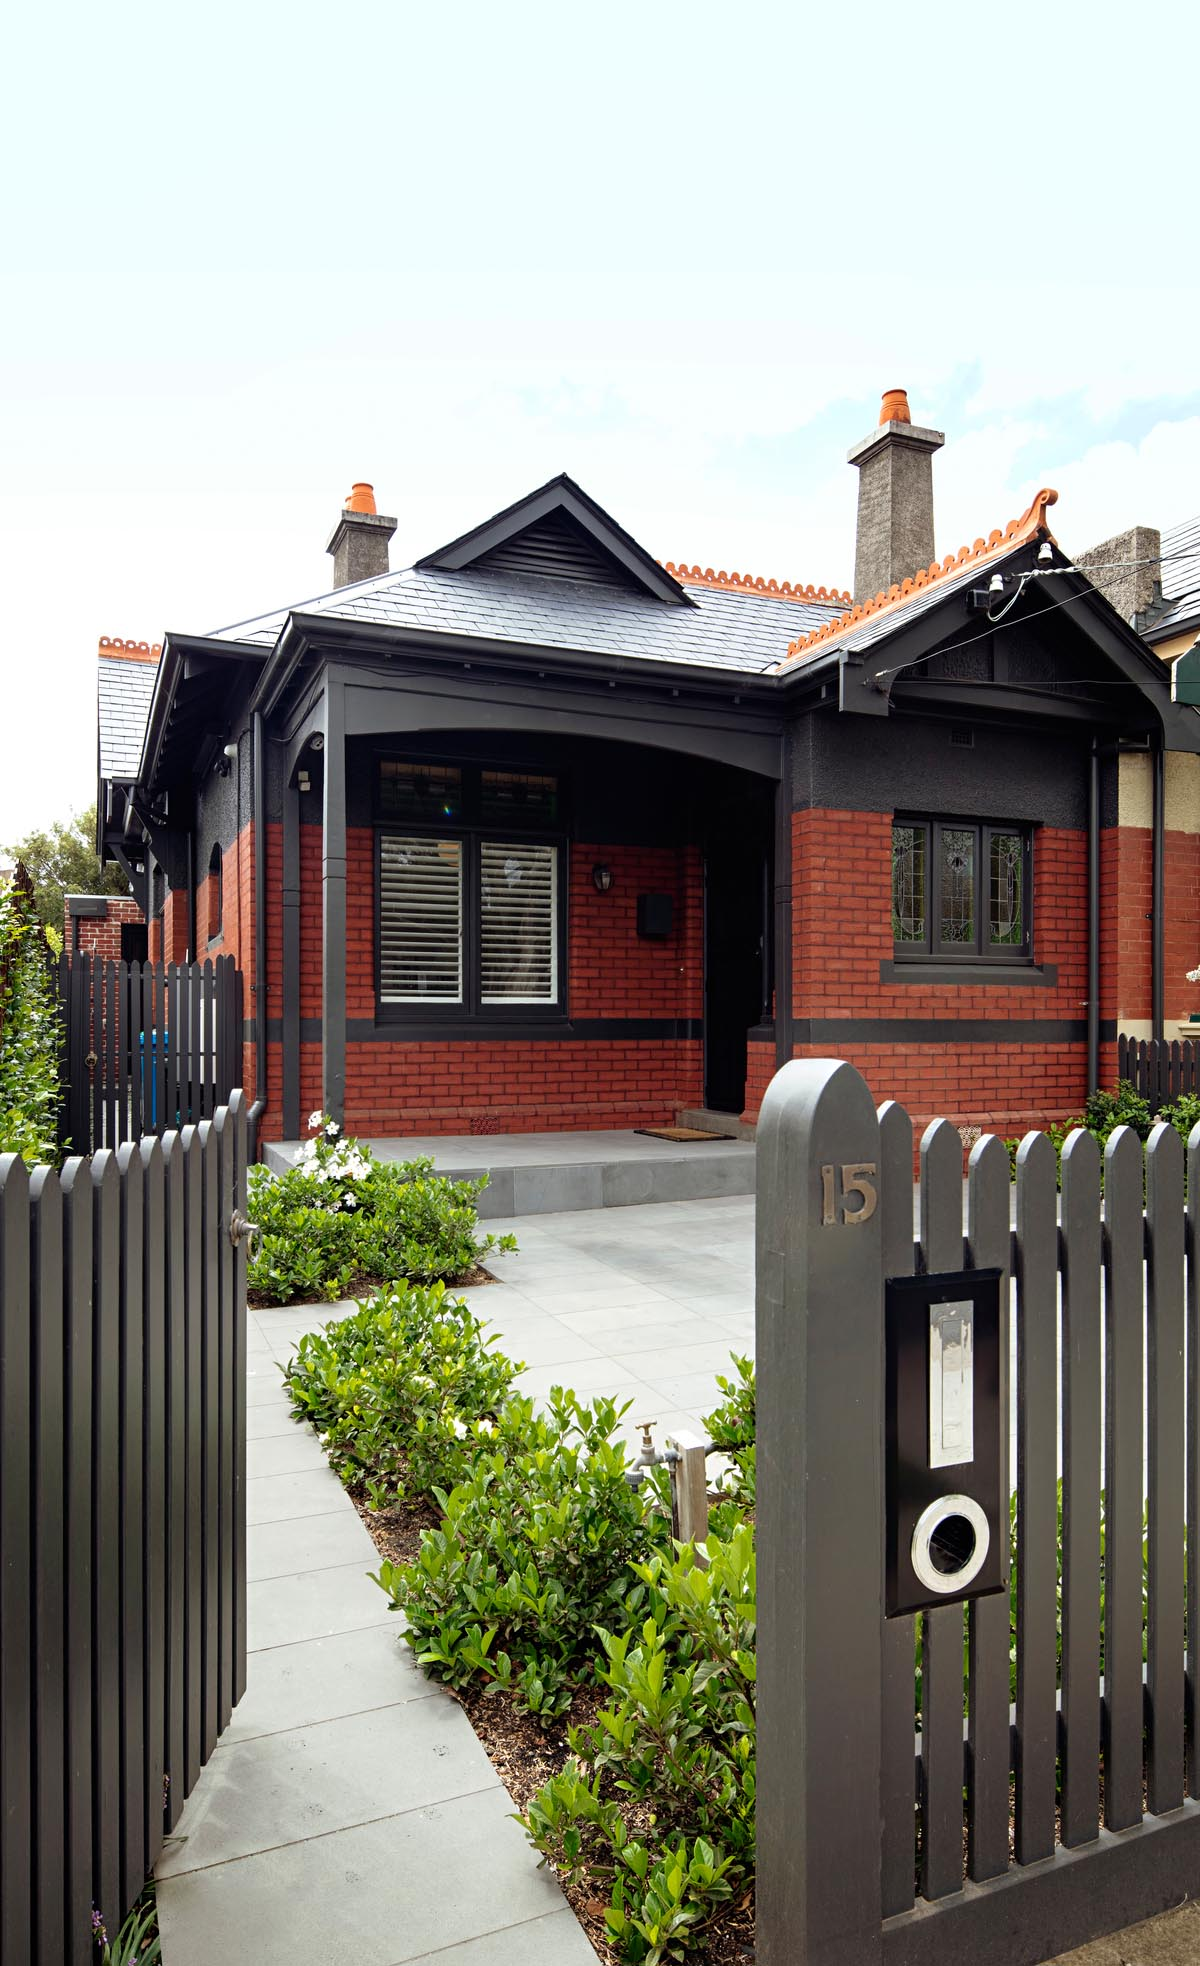 An Australian home with dark grey trim and red bricks.